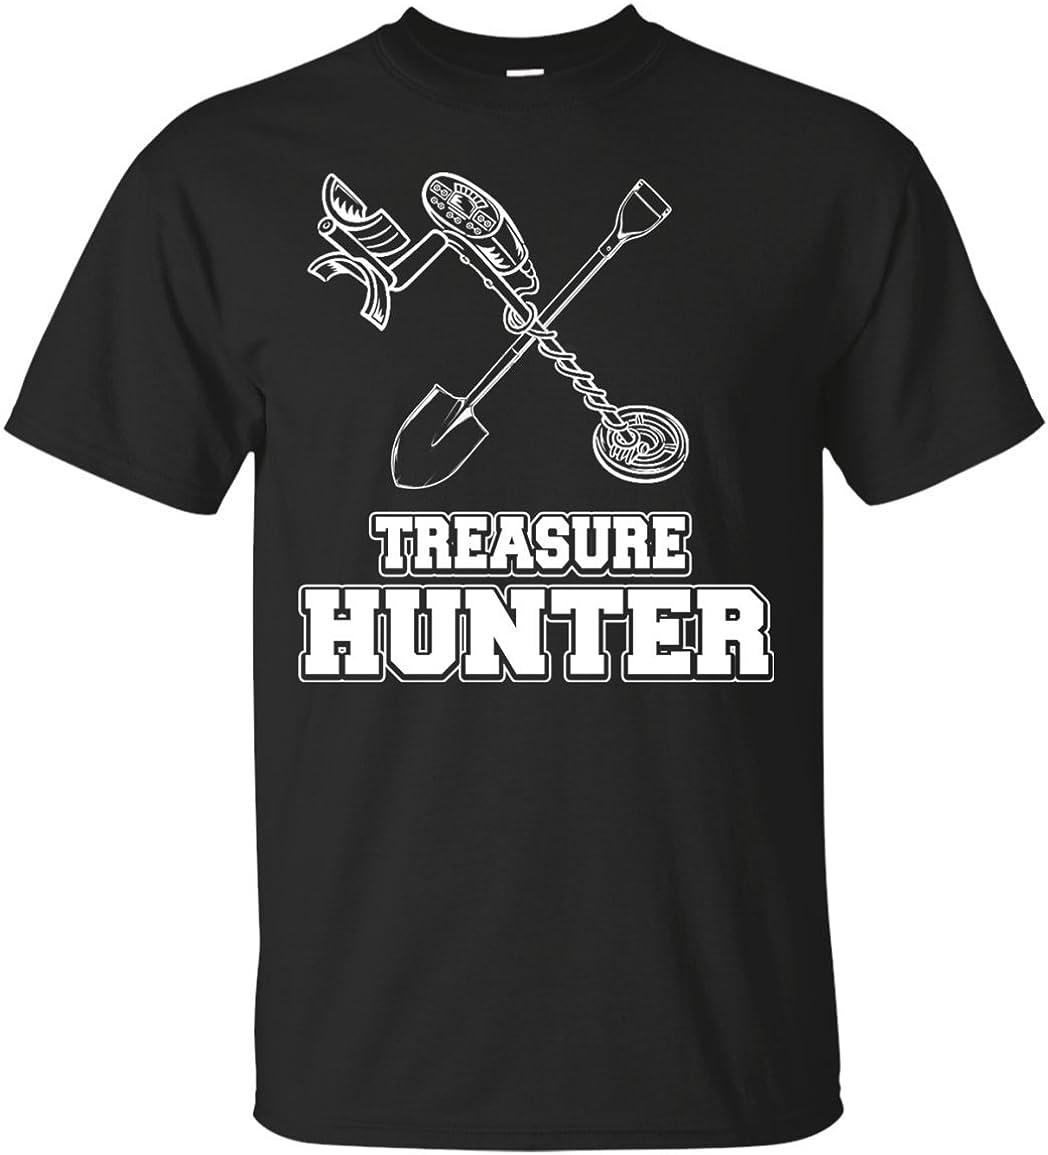 Treasure Hunters Metal Detector Hunting Gear Tracker T-Shirt